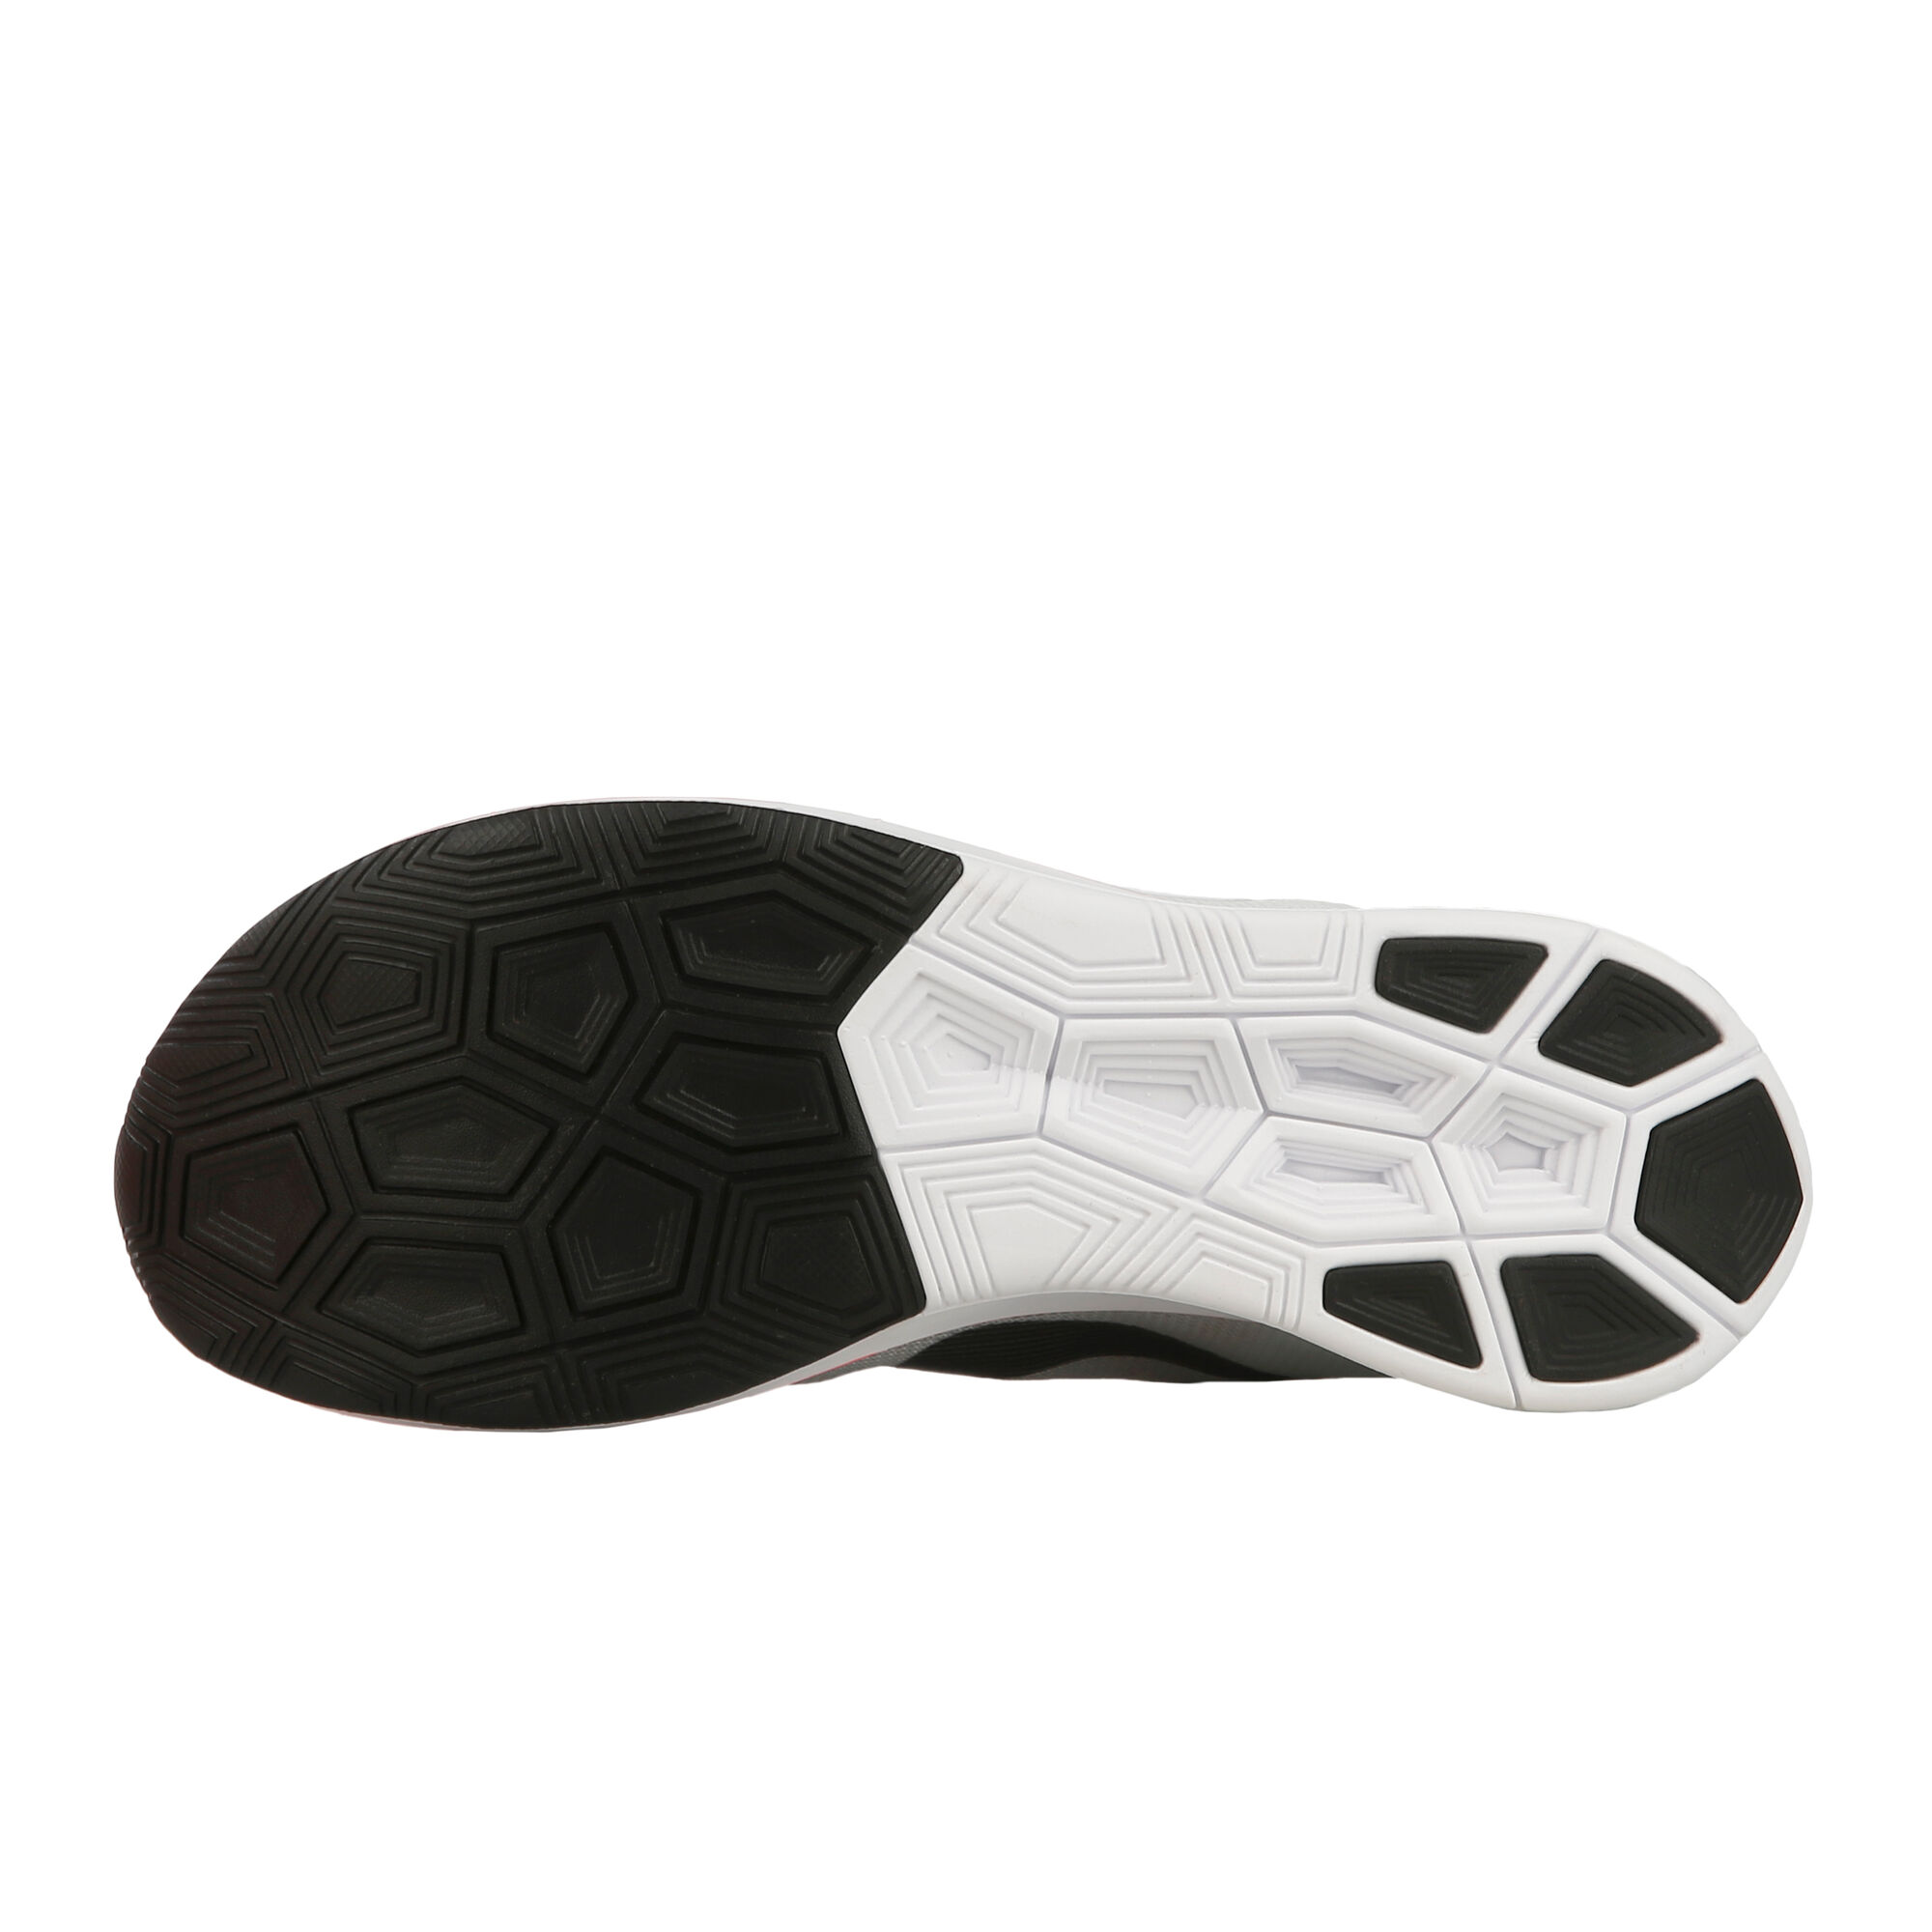 0c5e814e5d7e3 buy Nike Zoom Fly Neutral Running Shoe Women - Mint